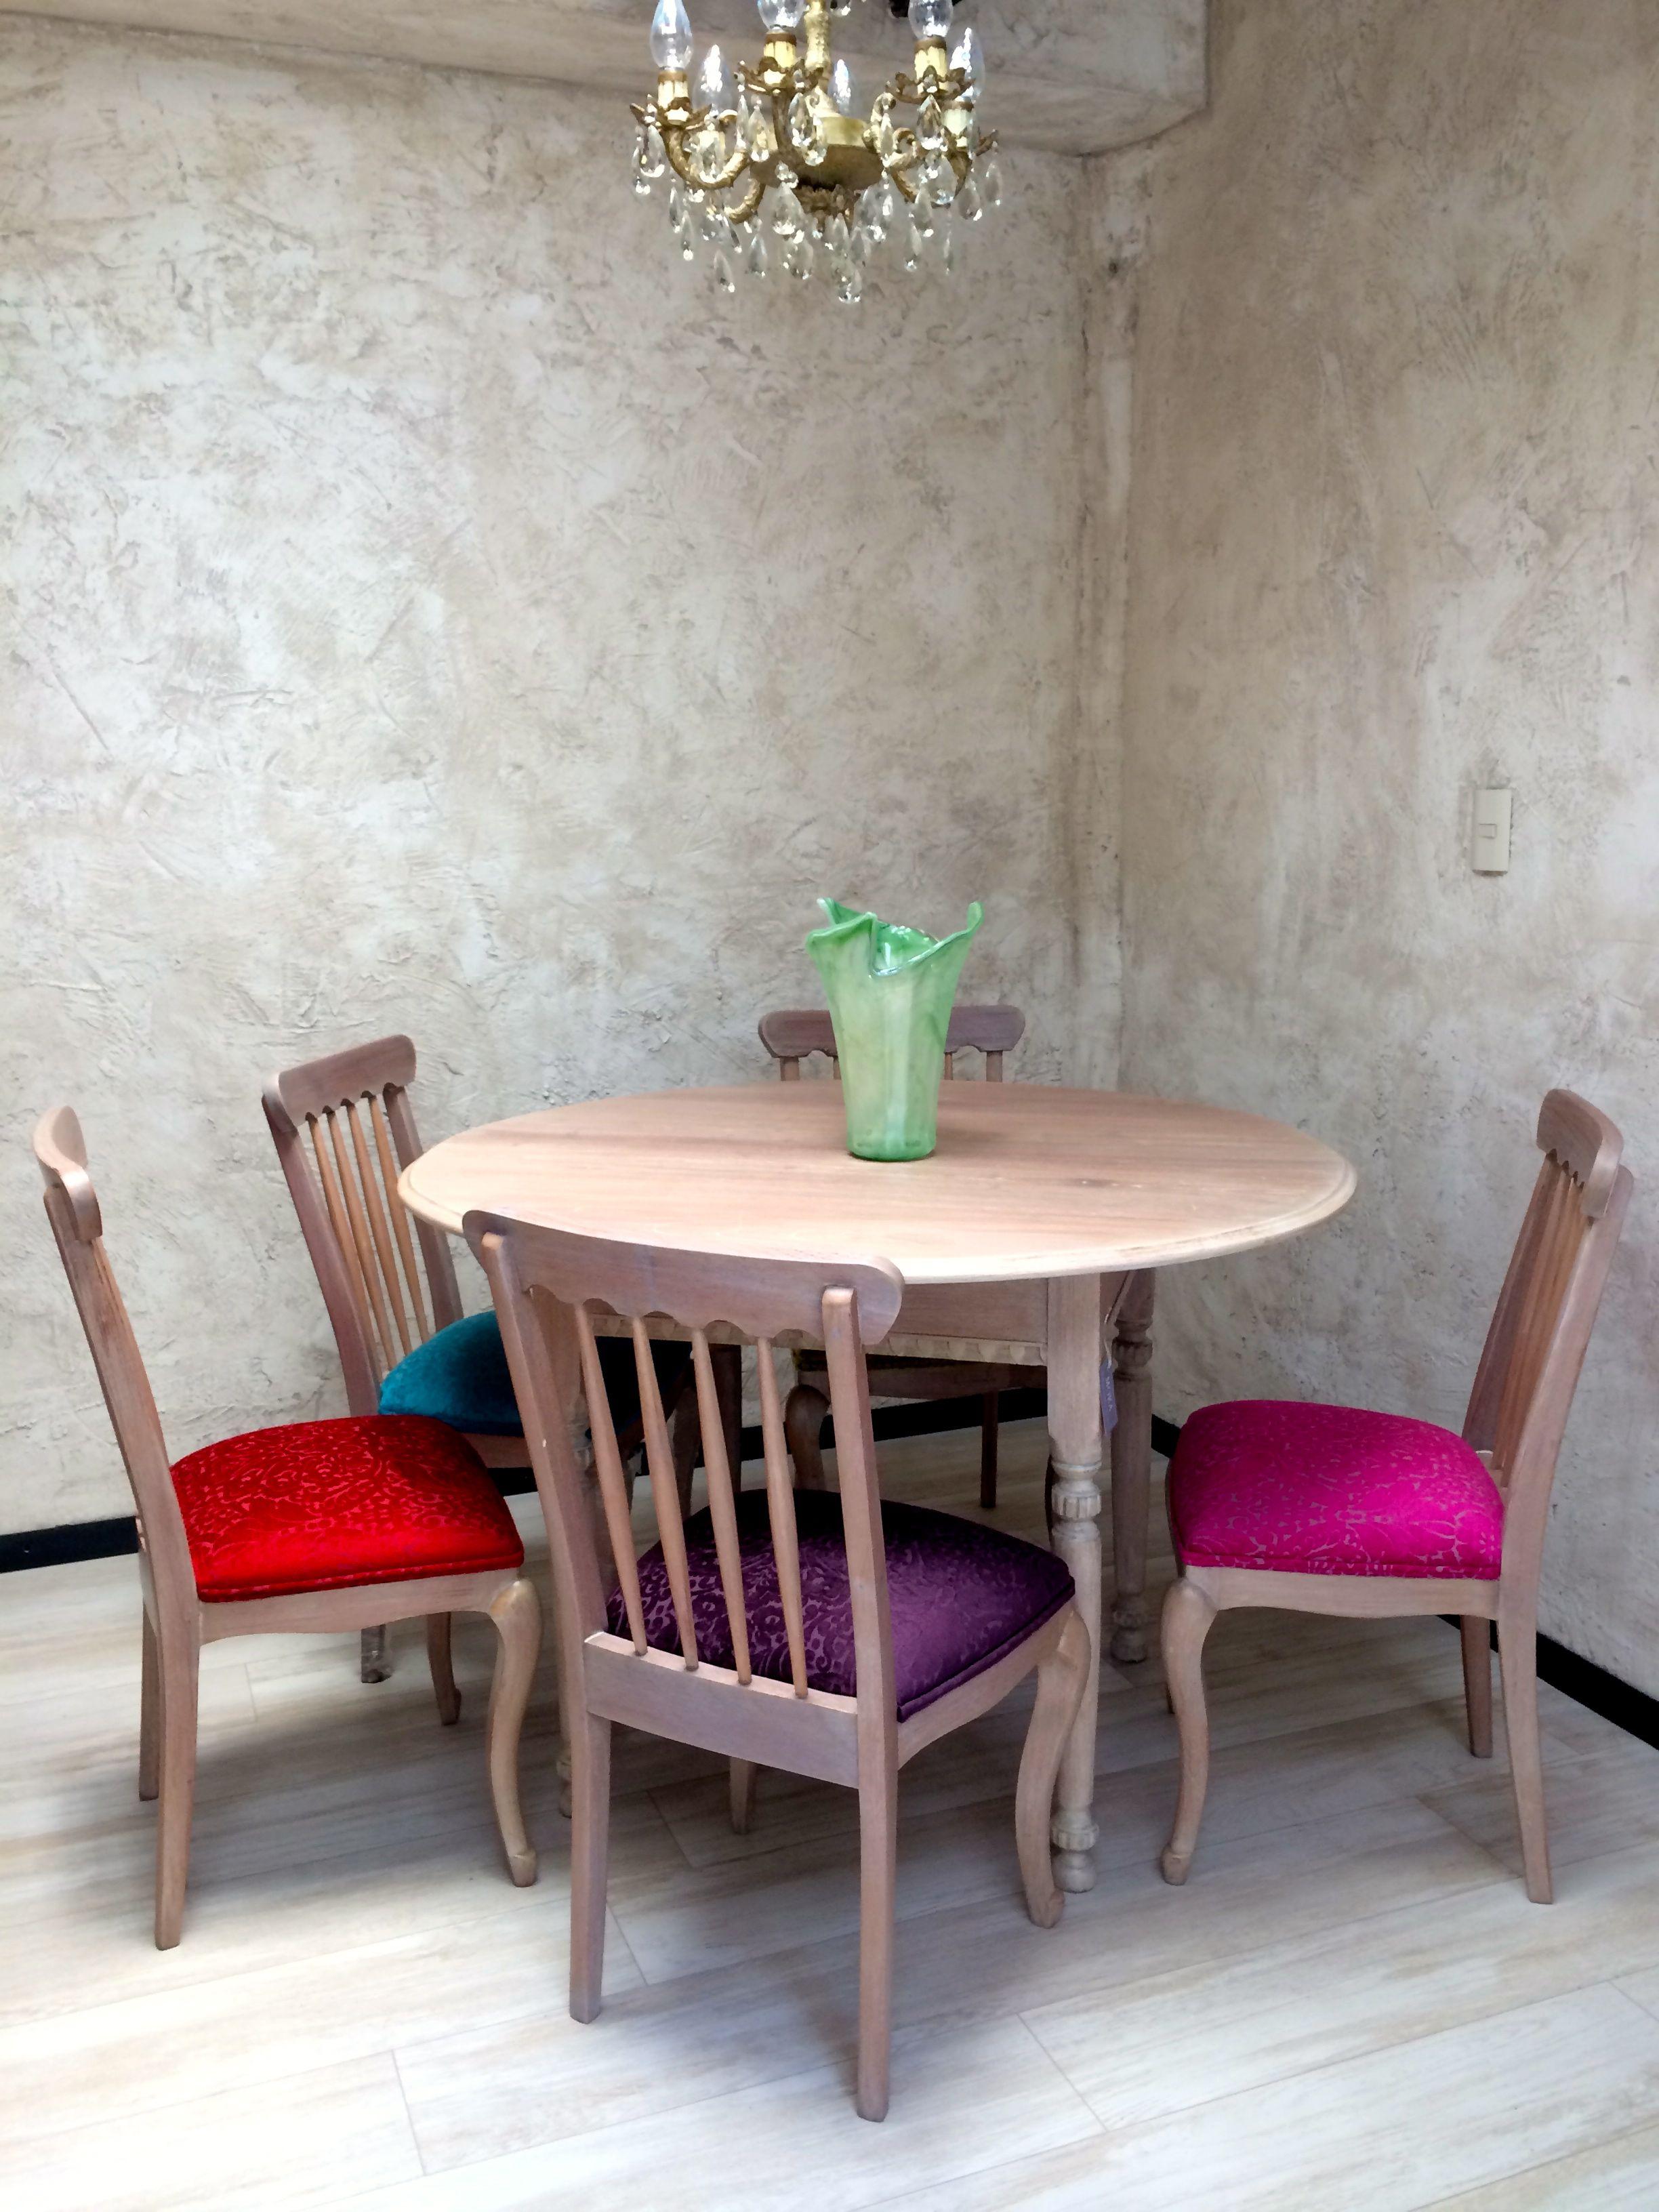 Ante comedor para 5 personas, color claro, cada silla con gamuza de ...